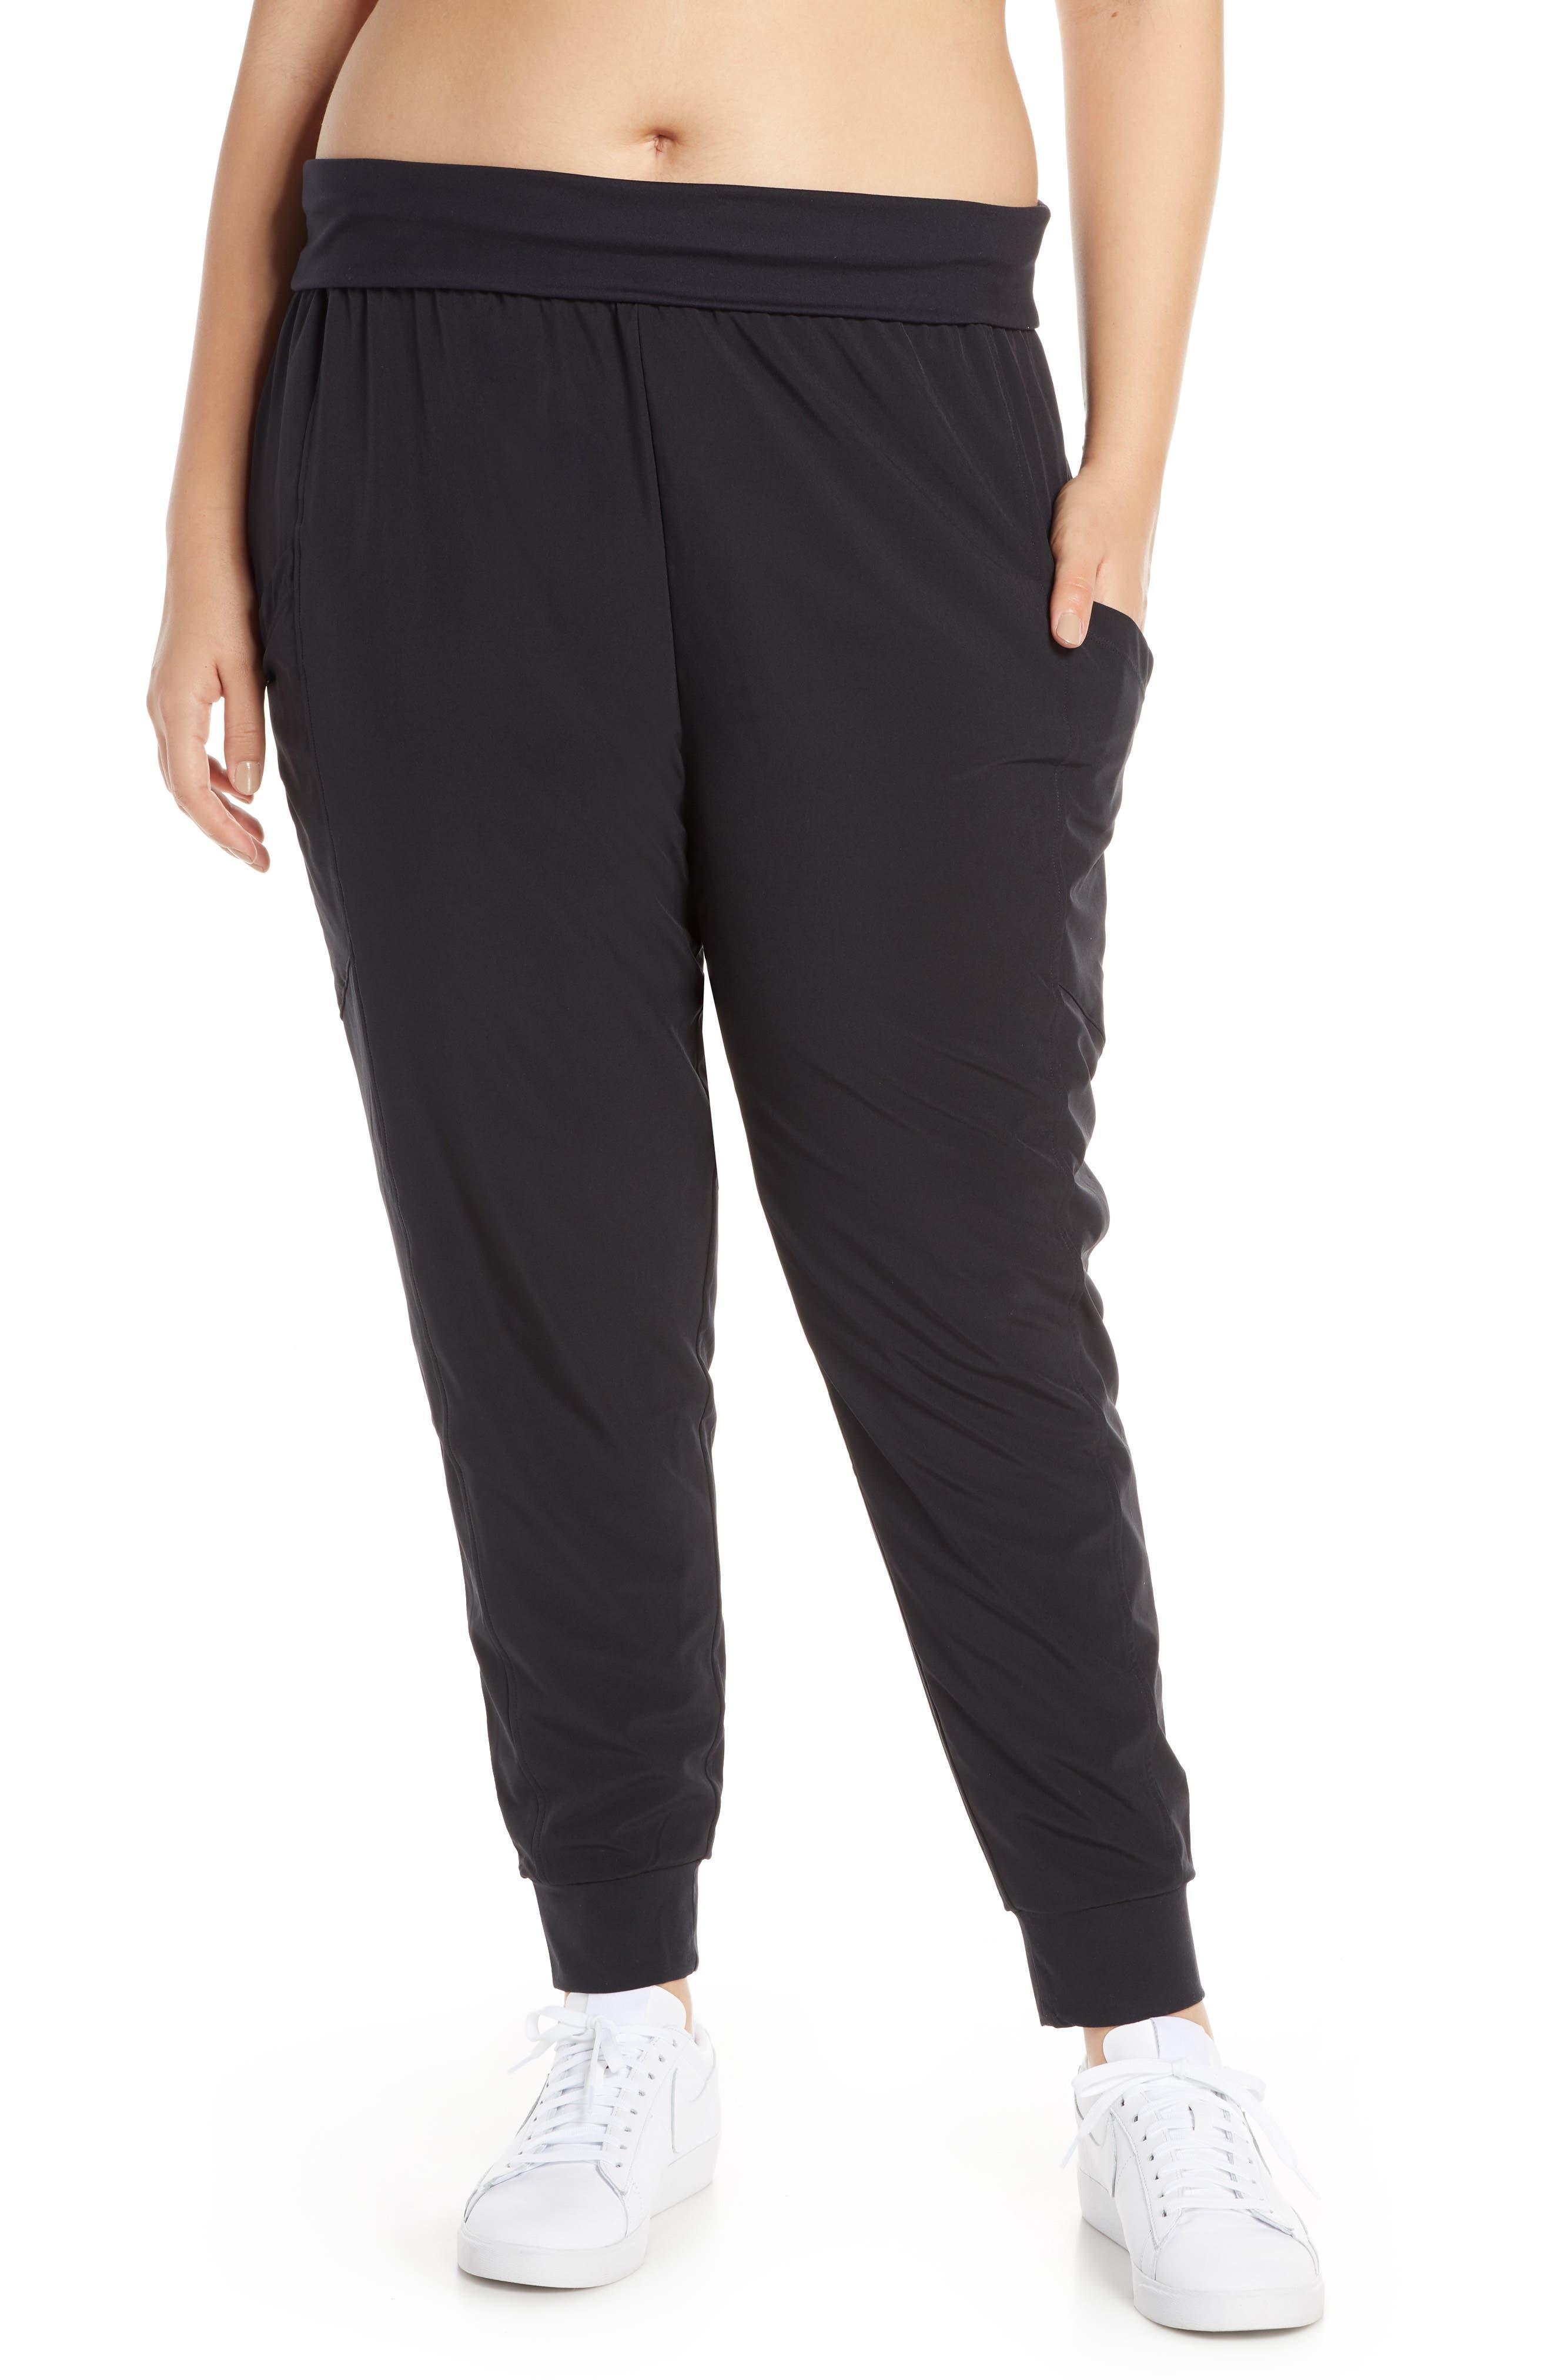 ZELLA, Urban Fold Down Waist Ankle Pants, Alternate thumbnail 2, color, BLACK